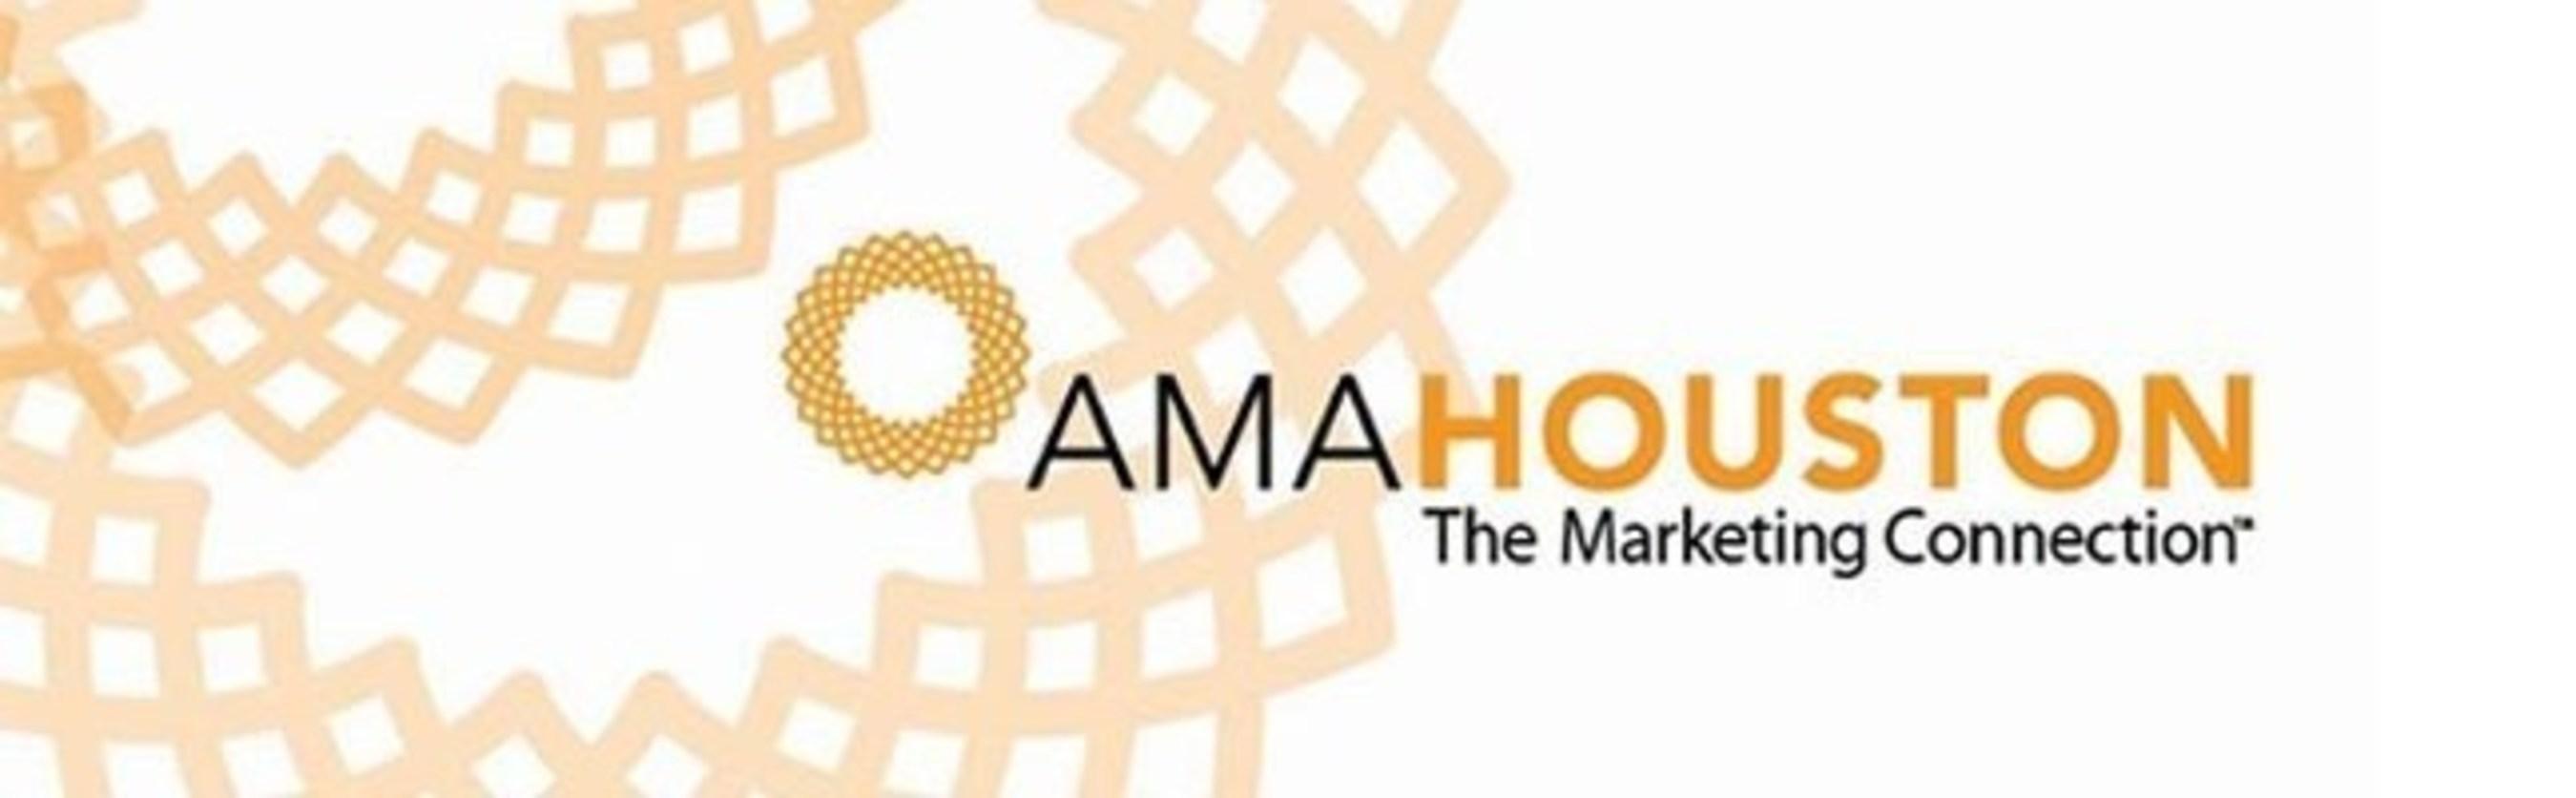 American Marketing Association - Houston Chapter